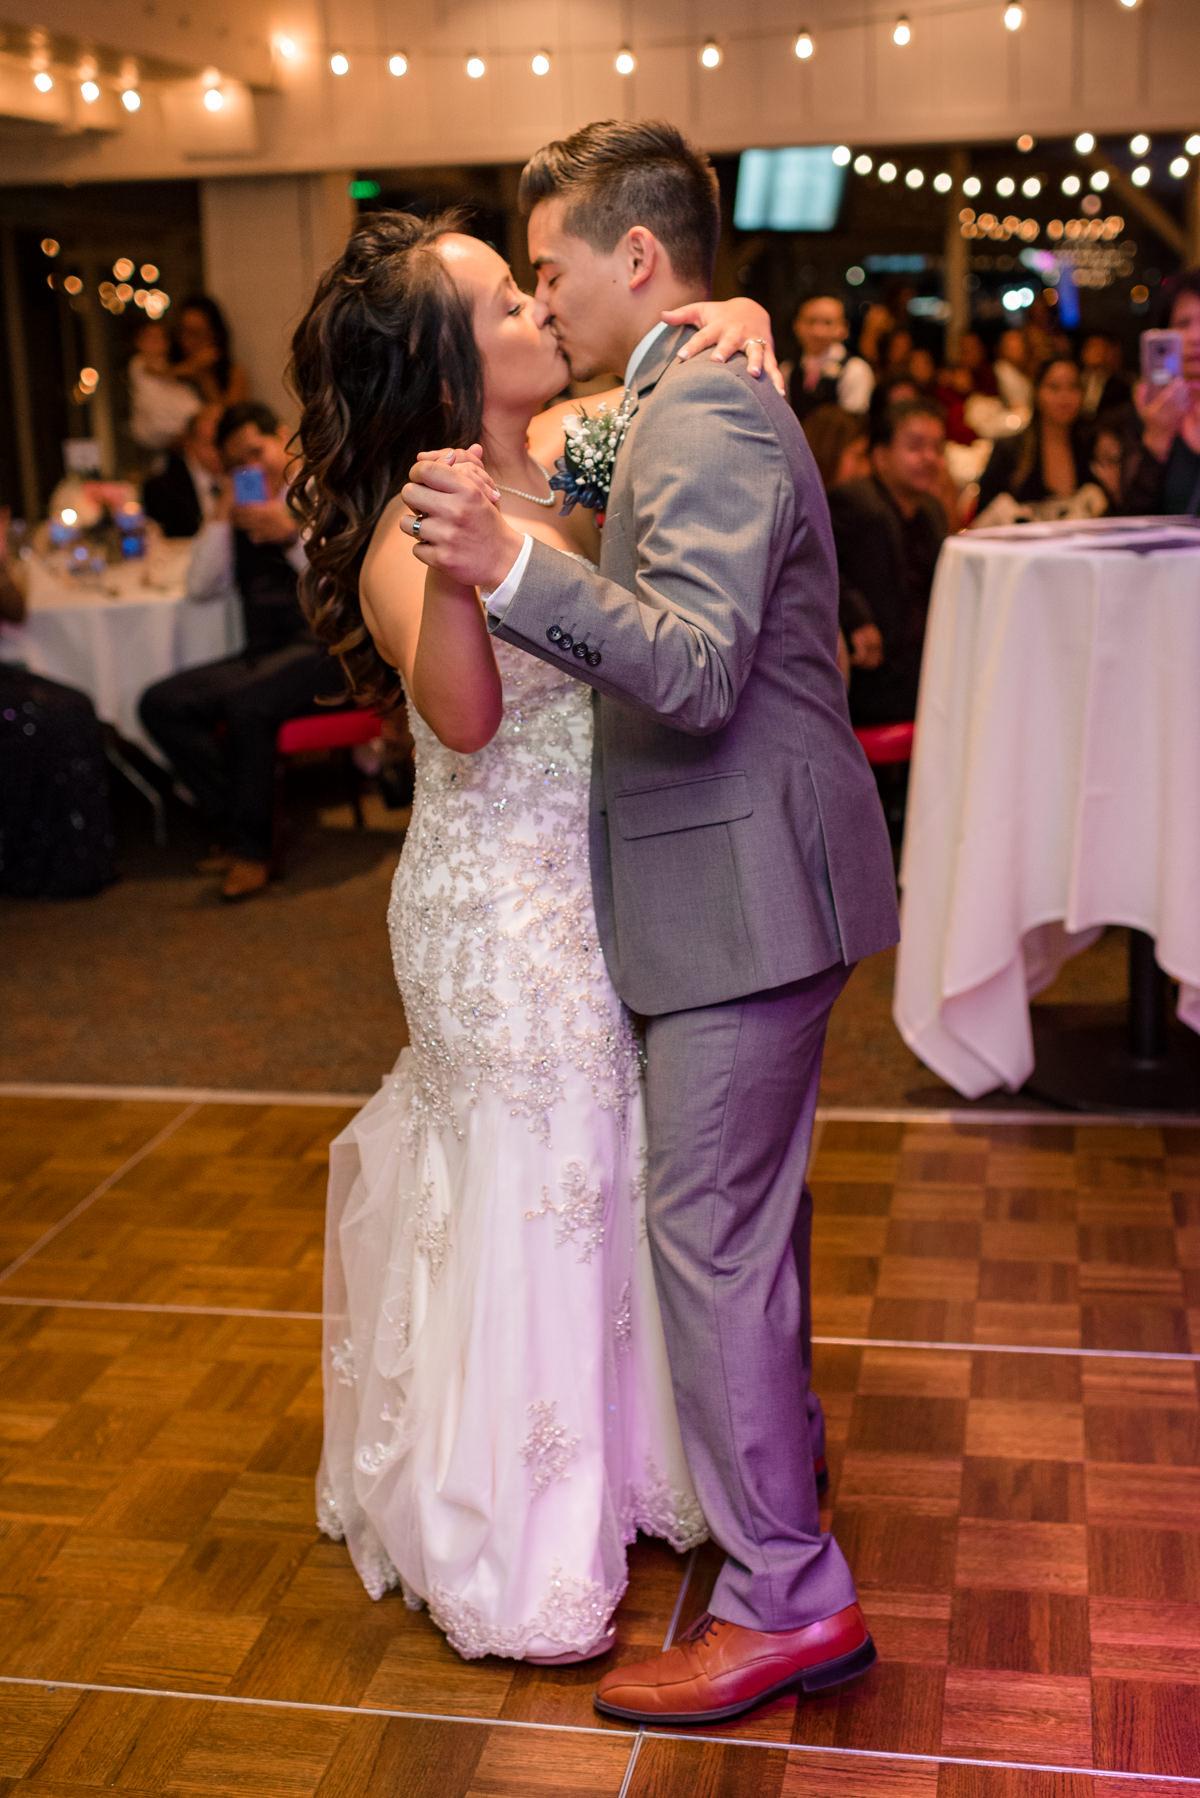 Andrew Tat - Documentary Wedding Photography - Salty's - Seattle, Washington -Mark & Marcy - 21.jpg